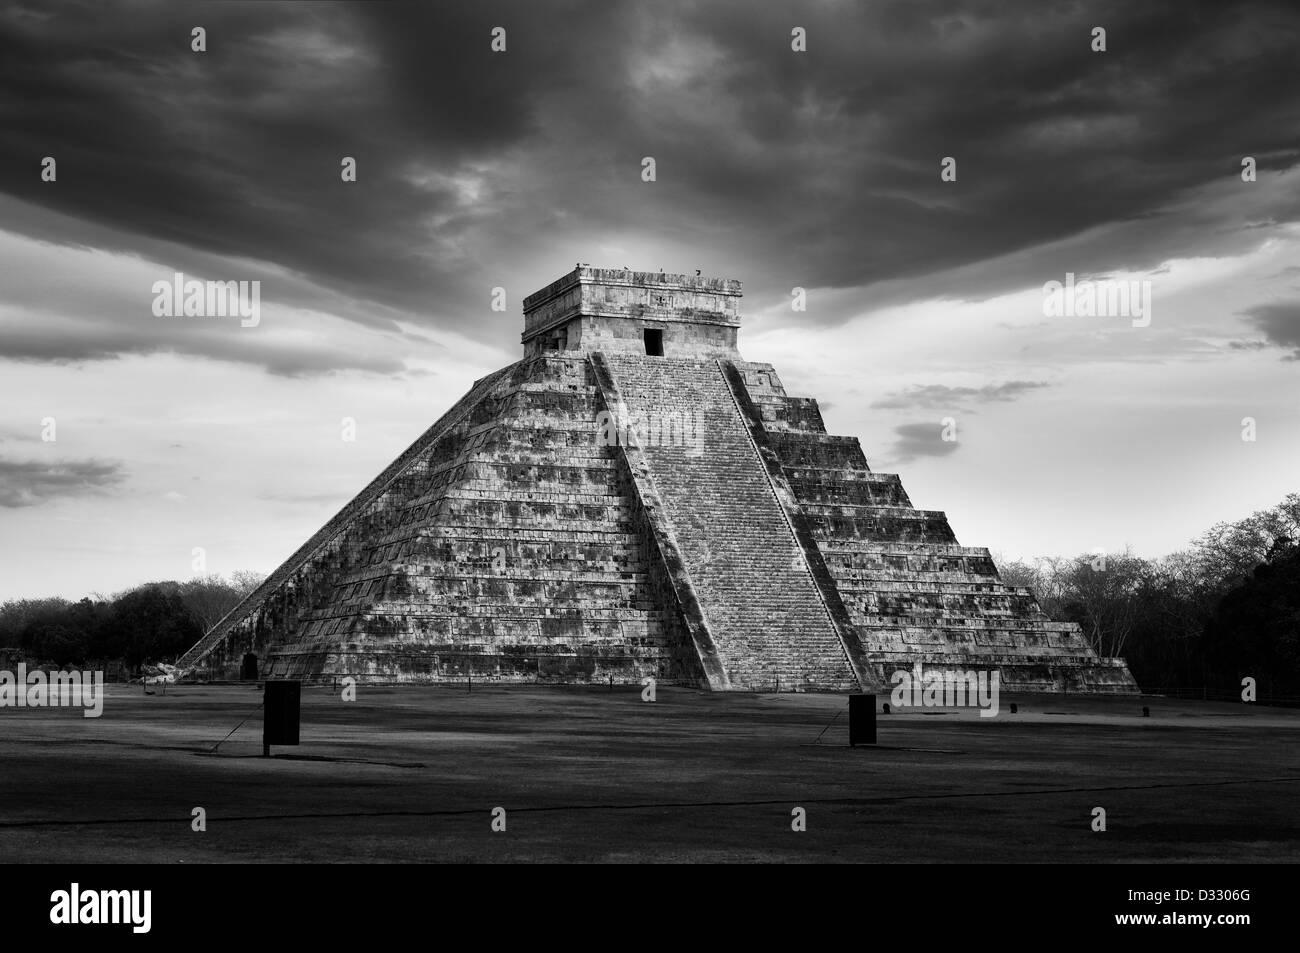 La Piramide Maya in Chitcen Itza, Messico Immagini Stock